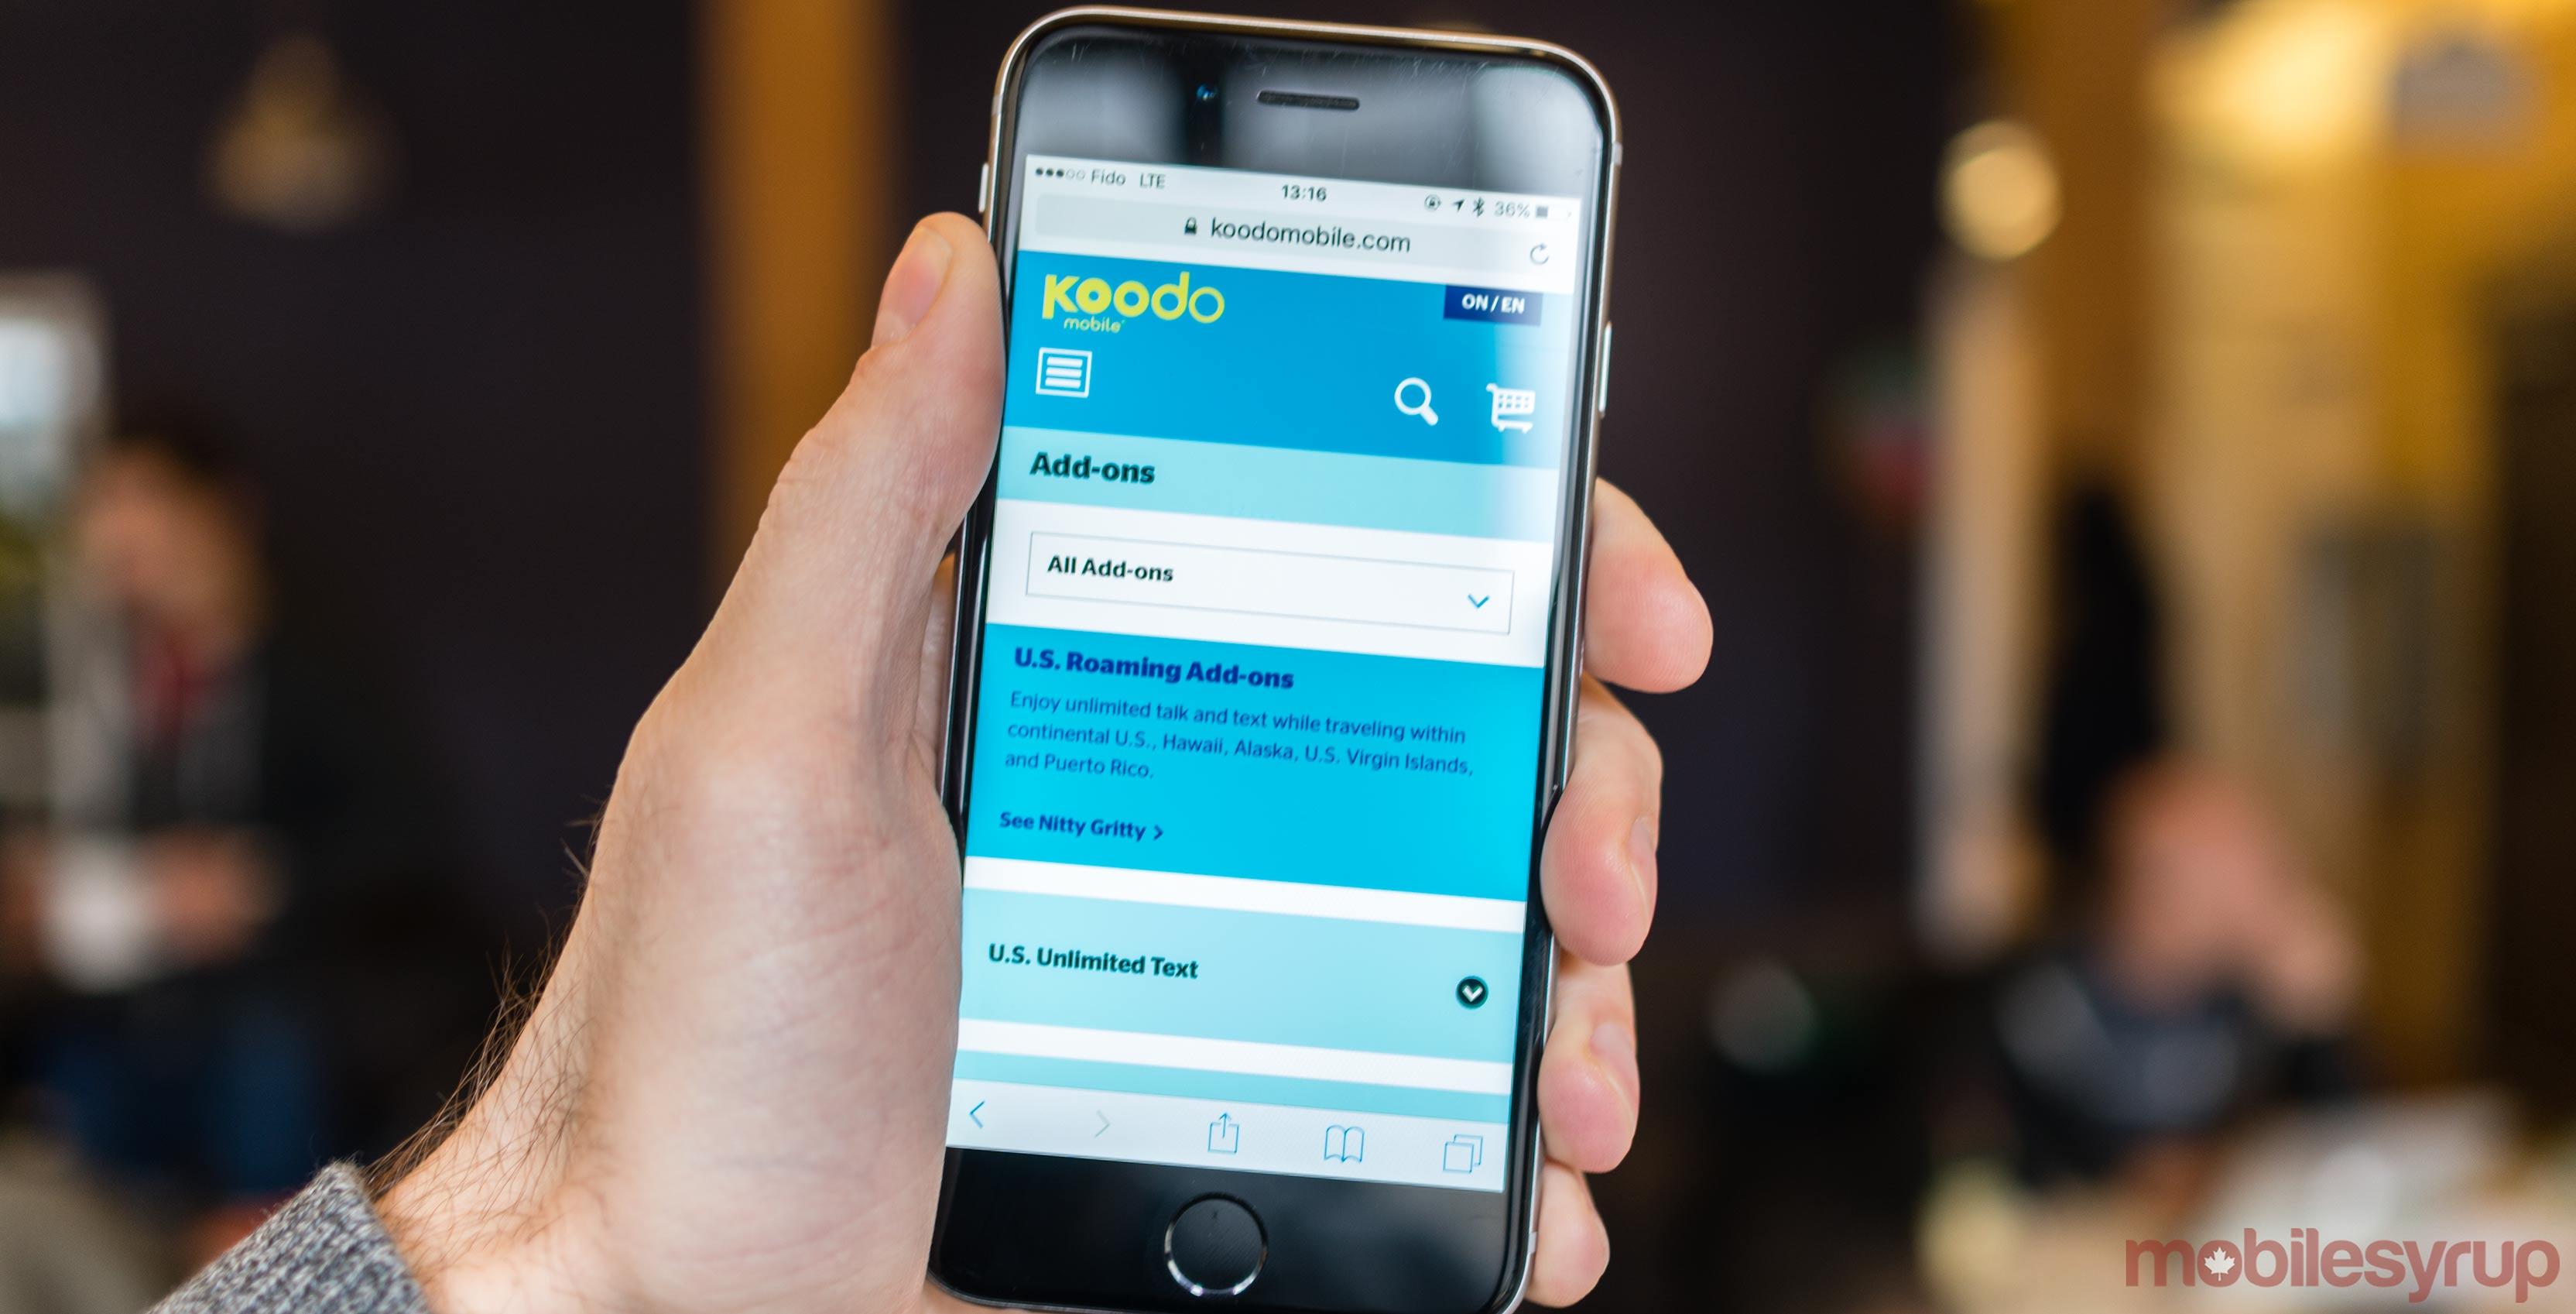 Koodo Mobile website